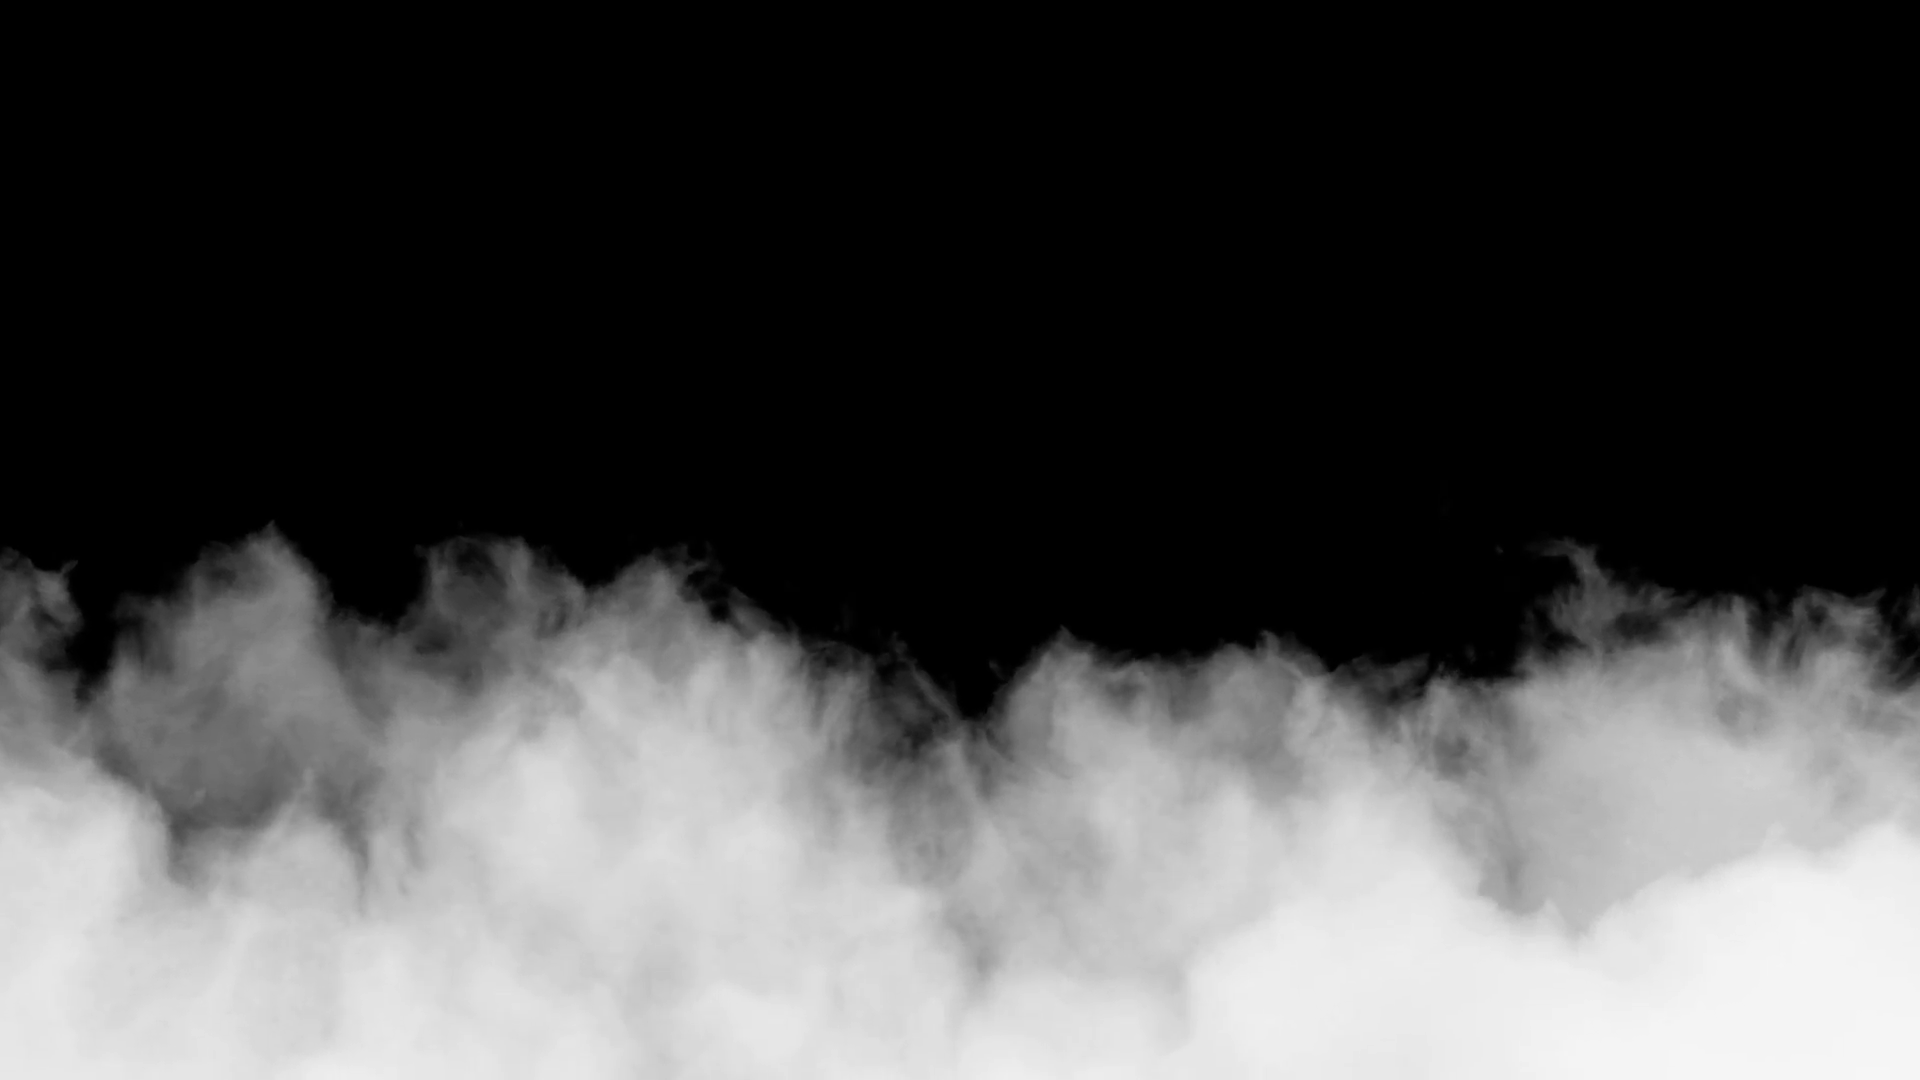 smoke-hd-png-rising-white-foggy-smoke-on-black-background-motion-background-videoblocks-1920.png